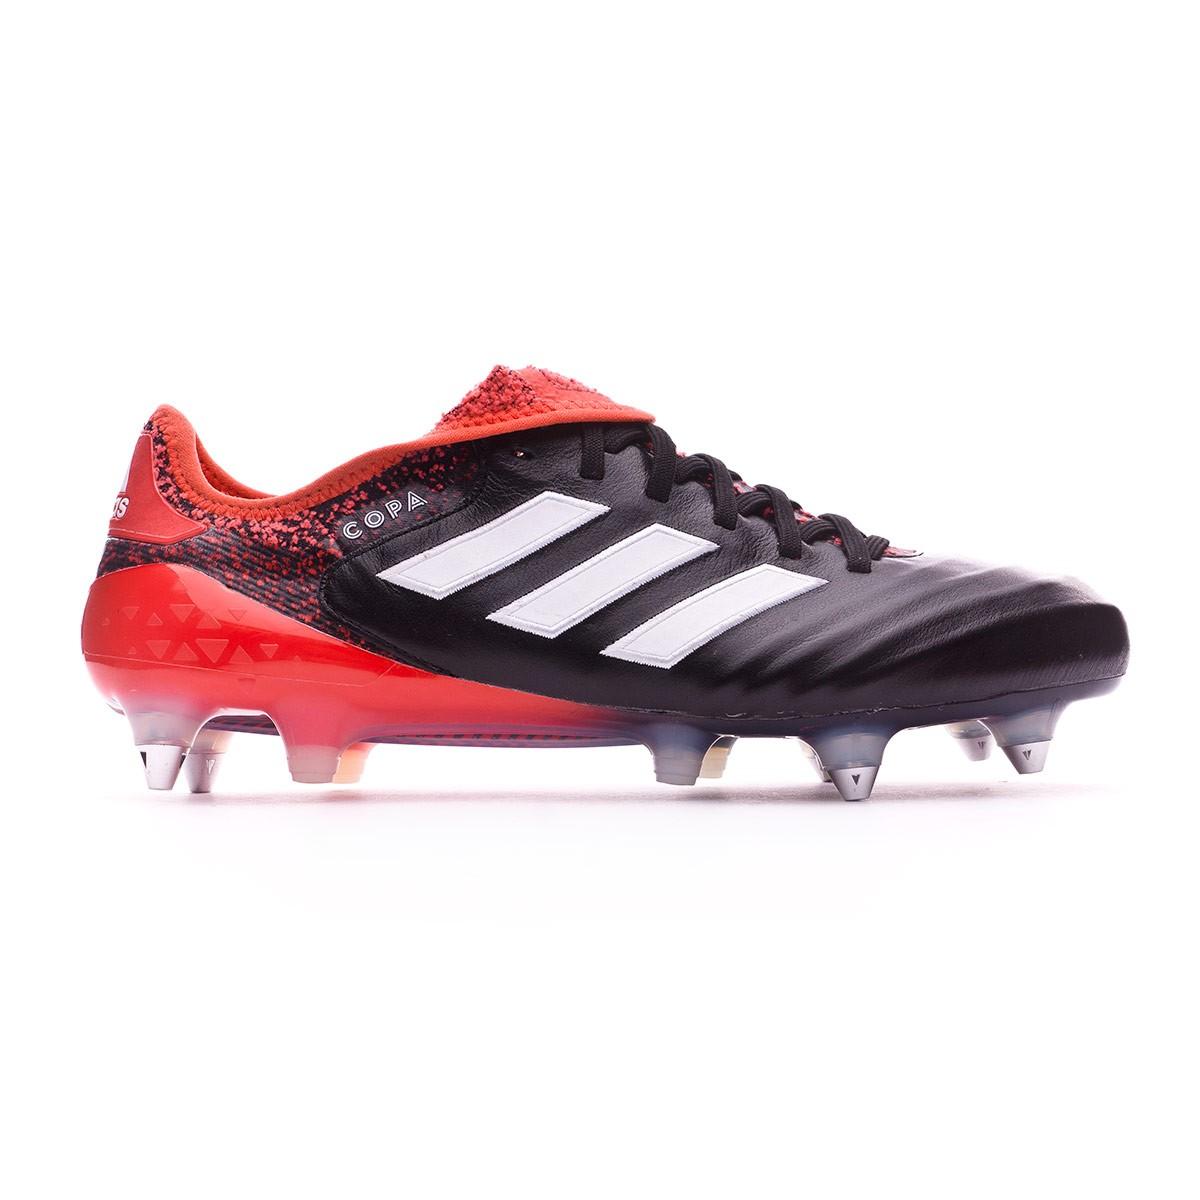 b6e6bde88353 Football Boots adidas Copa 18.1 SG Core black-White-Real coral - Football  store Fútbol Emotion